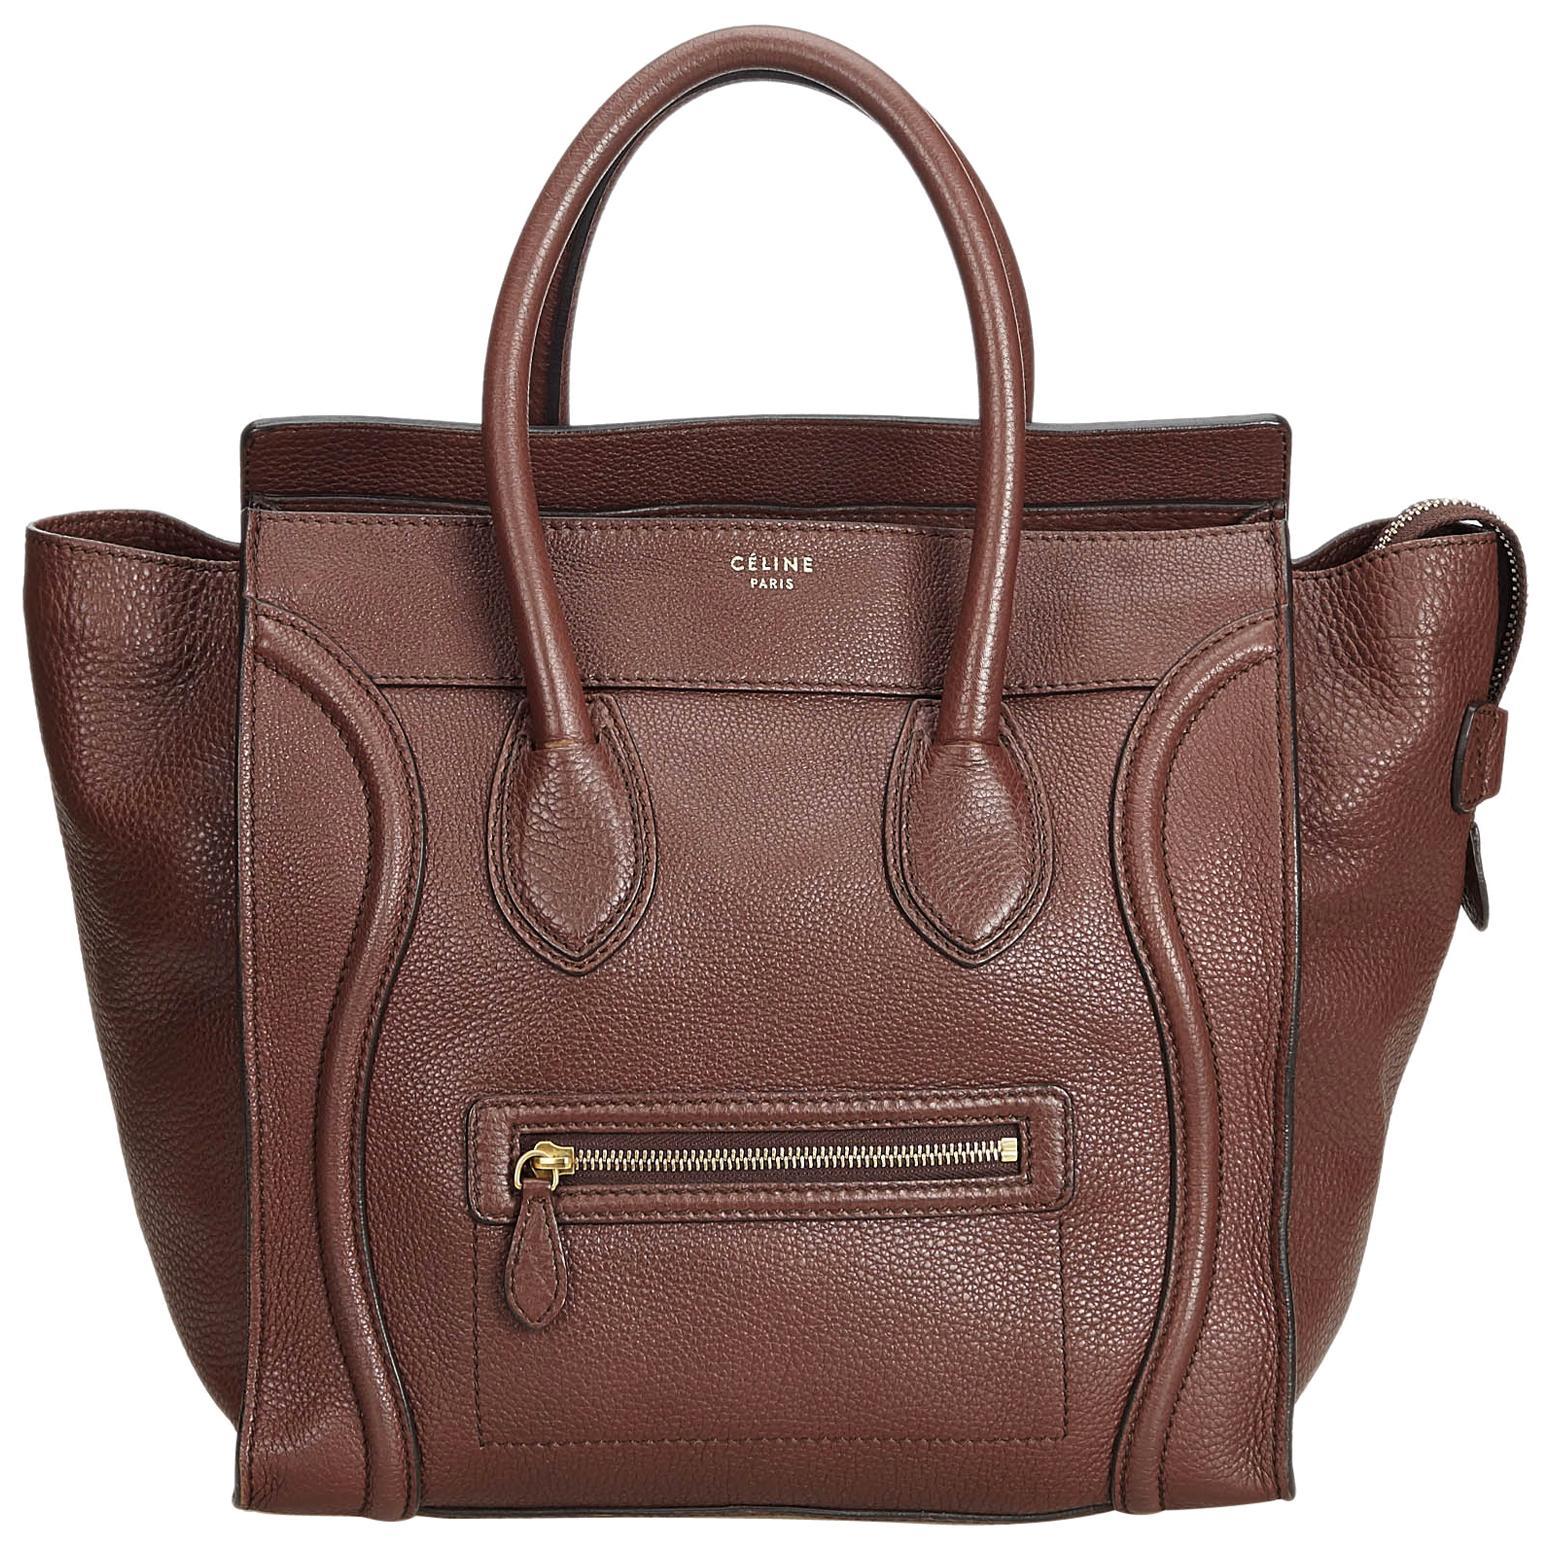 c2fd7bbae7 Luxclusif Handbags and Purses - 1stdibs